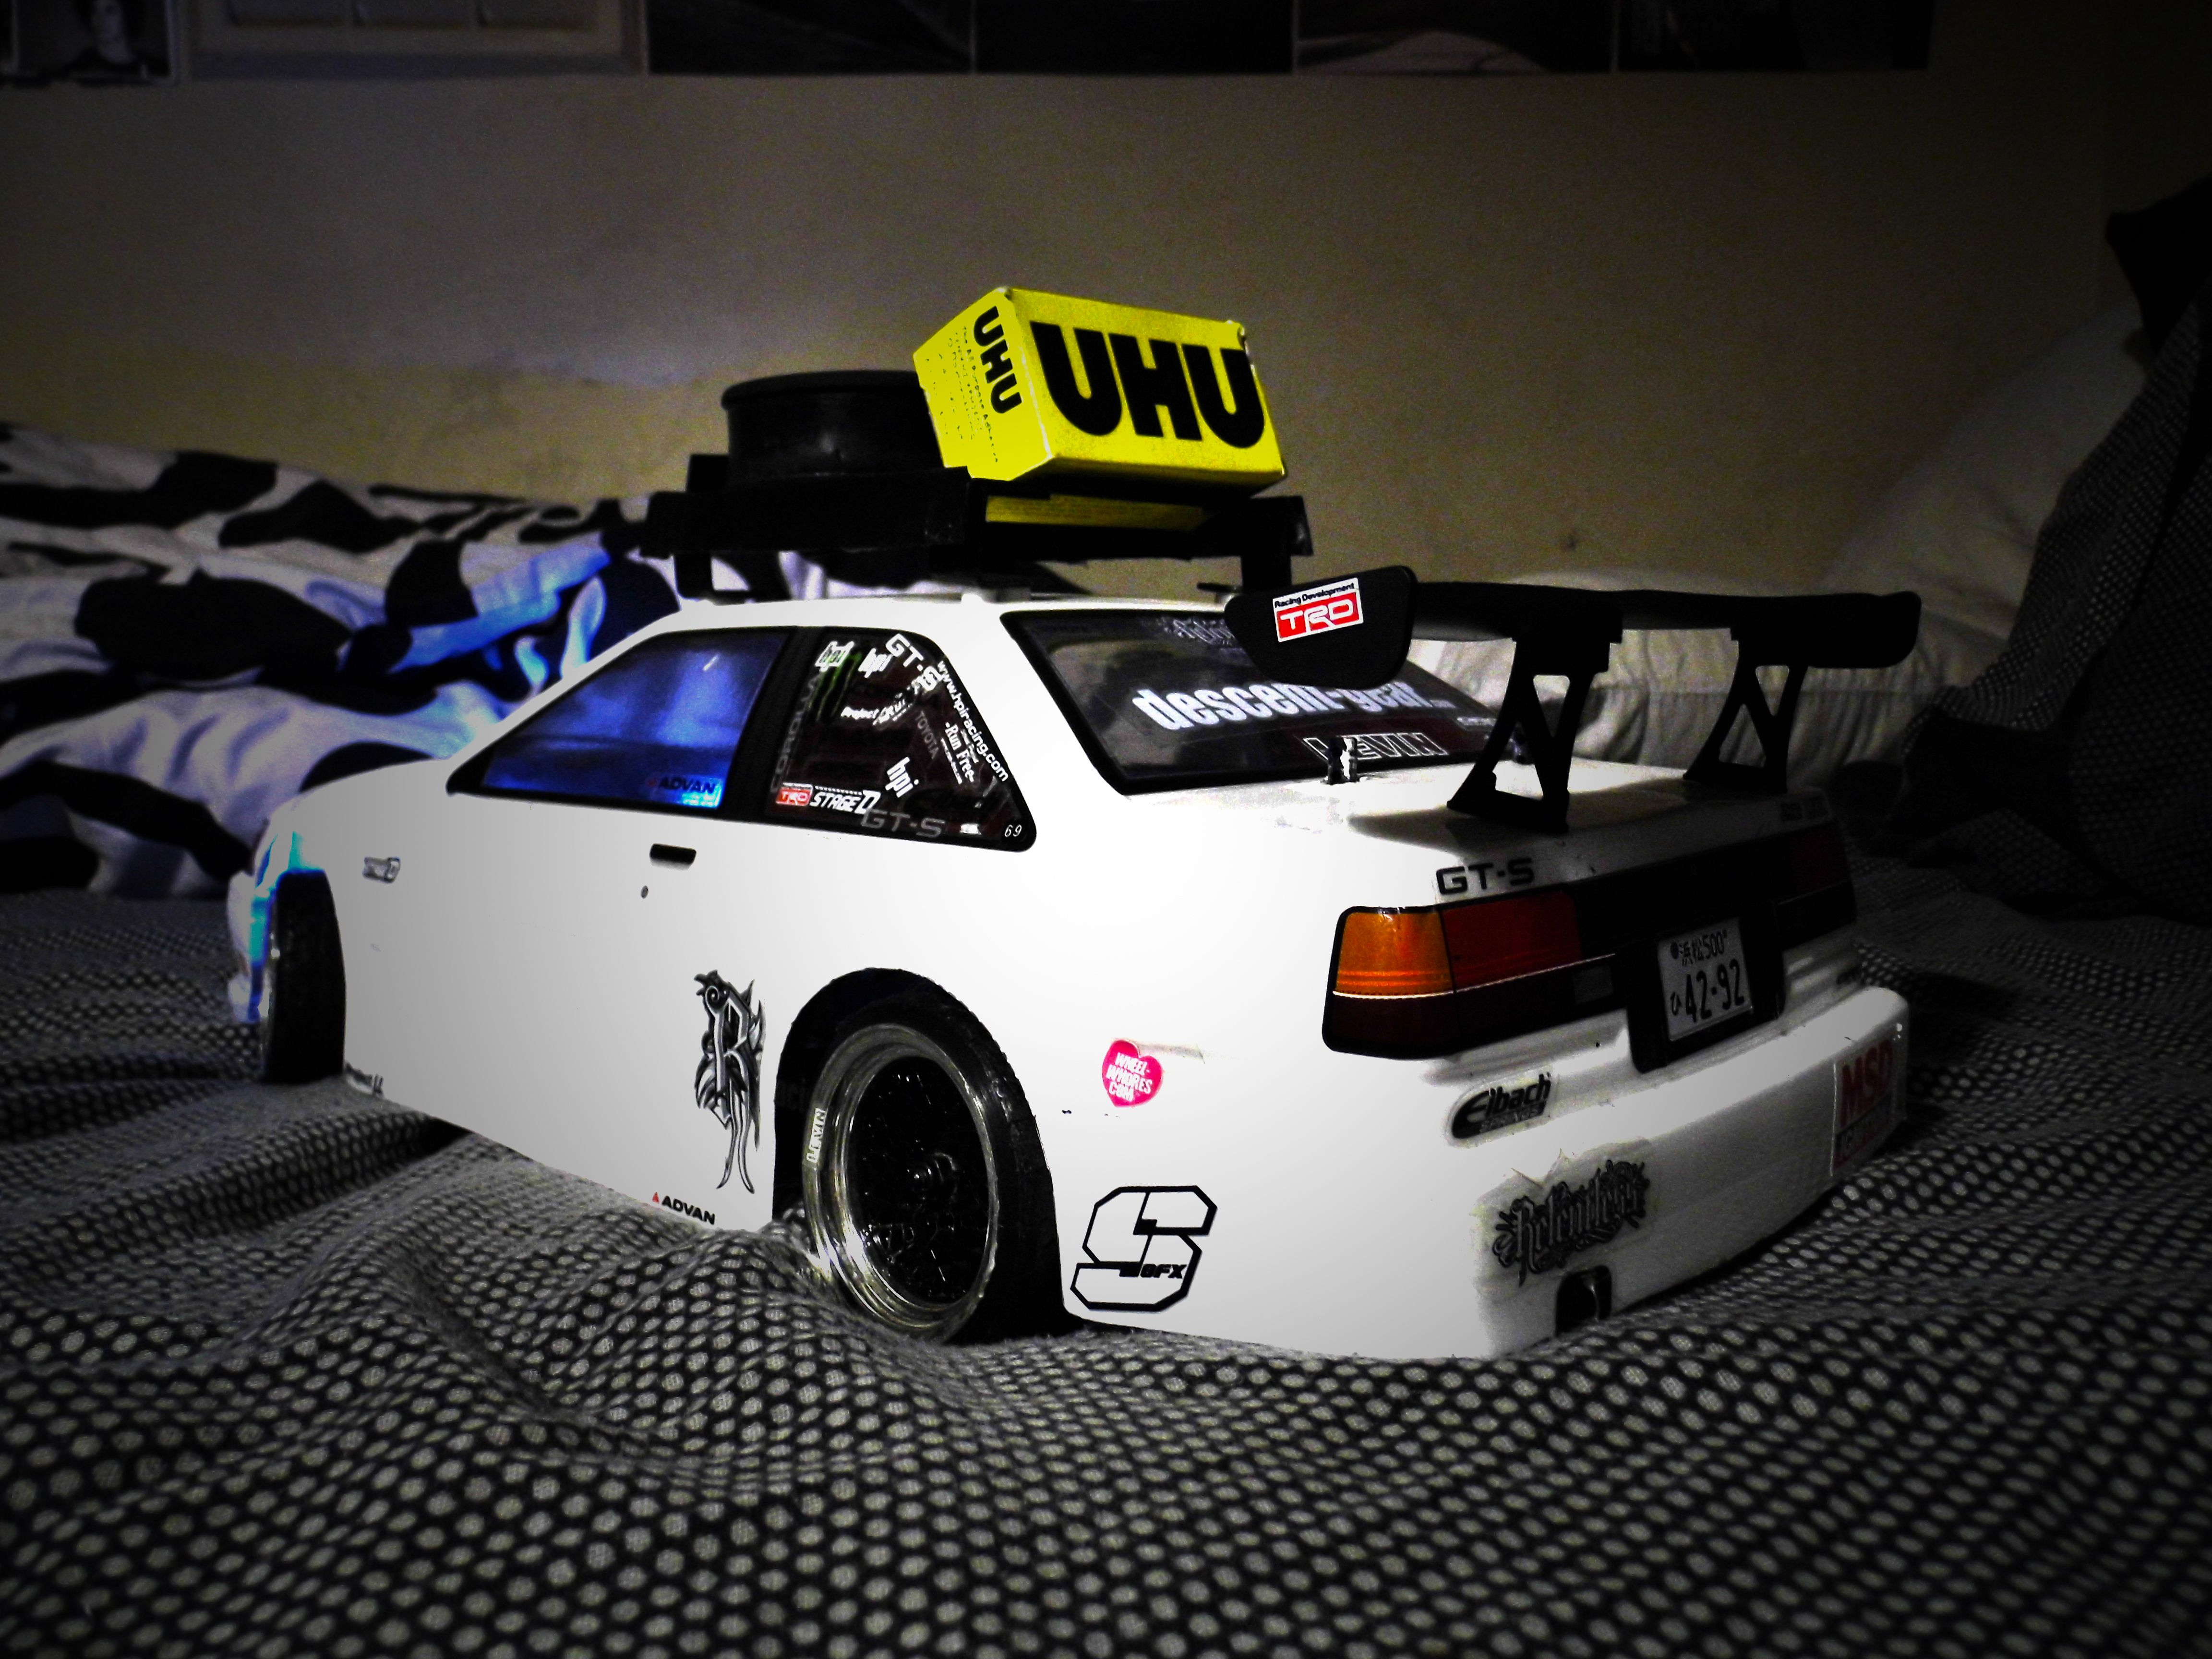 my car setup | RC | Rc drift cars, Rc cars, Rc drift